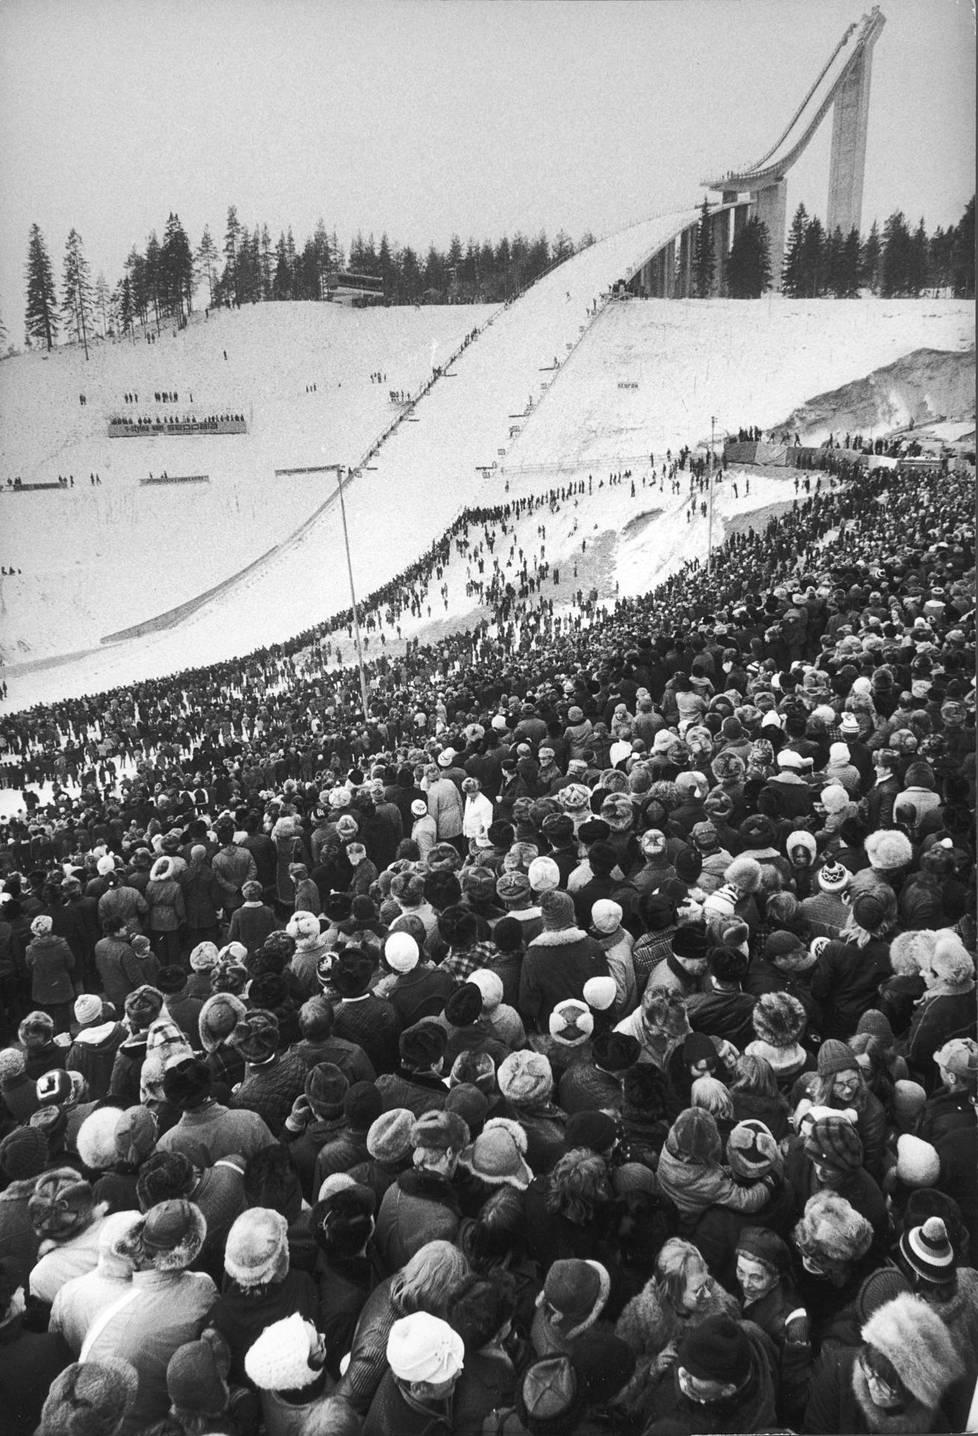 Suurmäki stumbled alone at the 1973 Salpausselä Games.